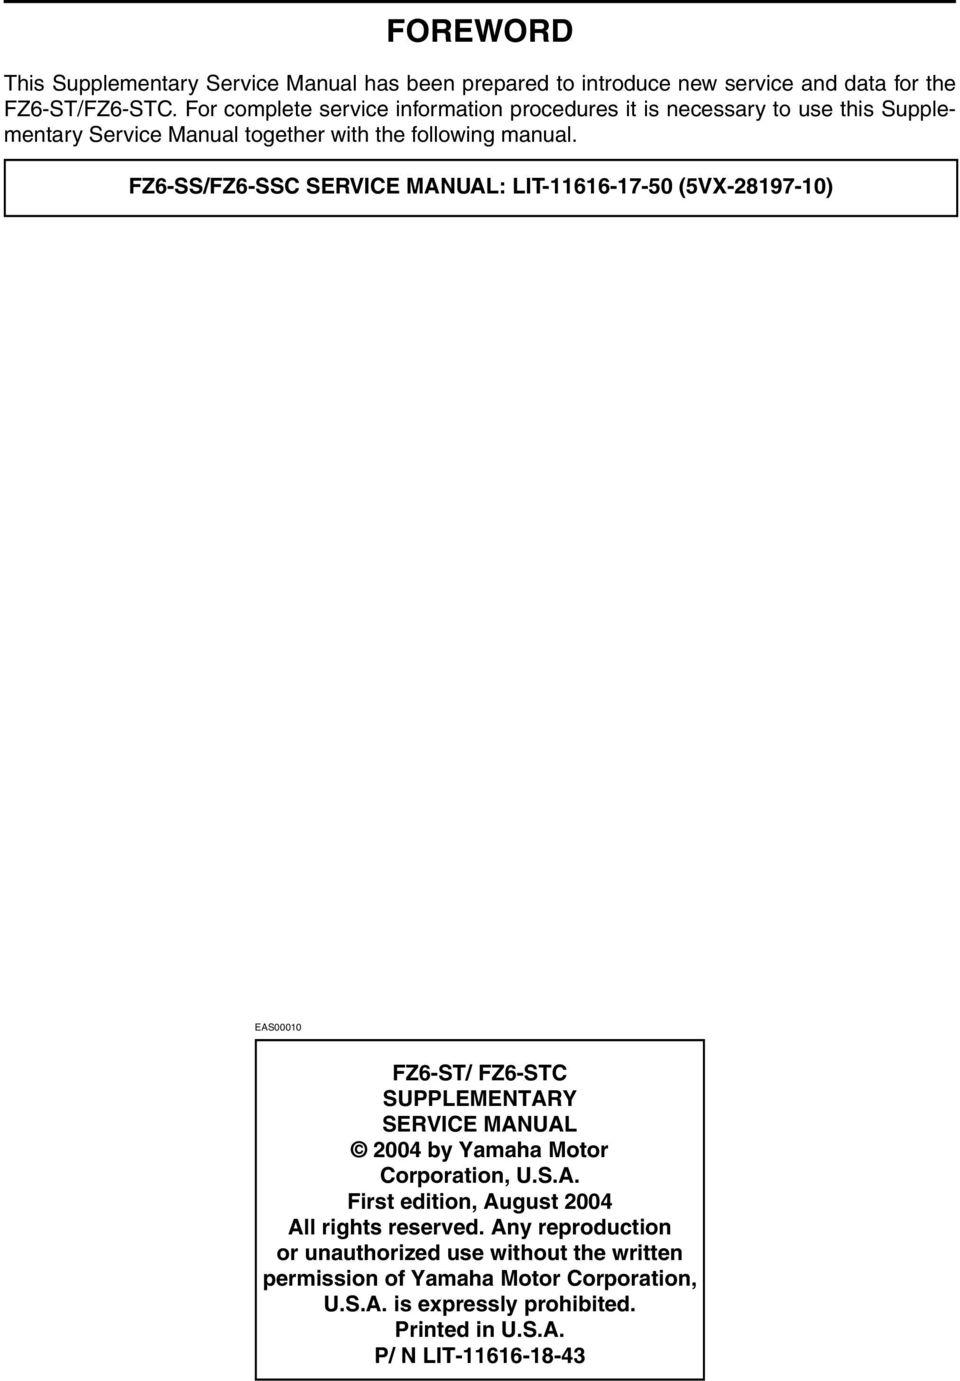 medium resolution of fz6 ss fz6 ssc service manual lit 66 7